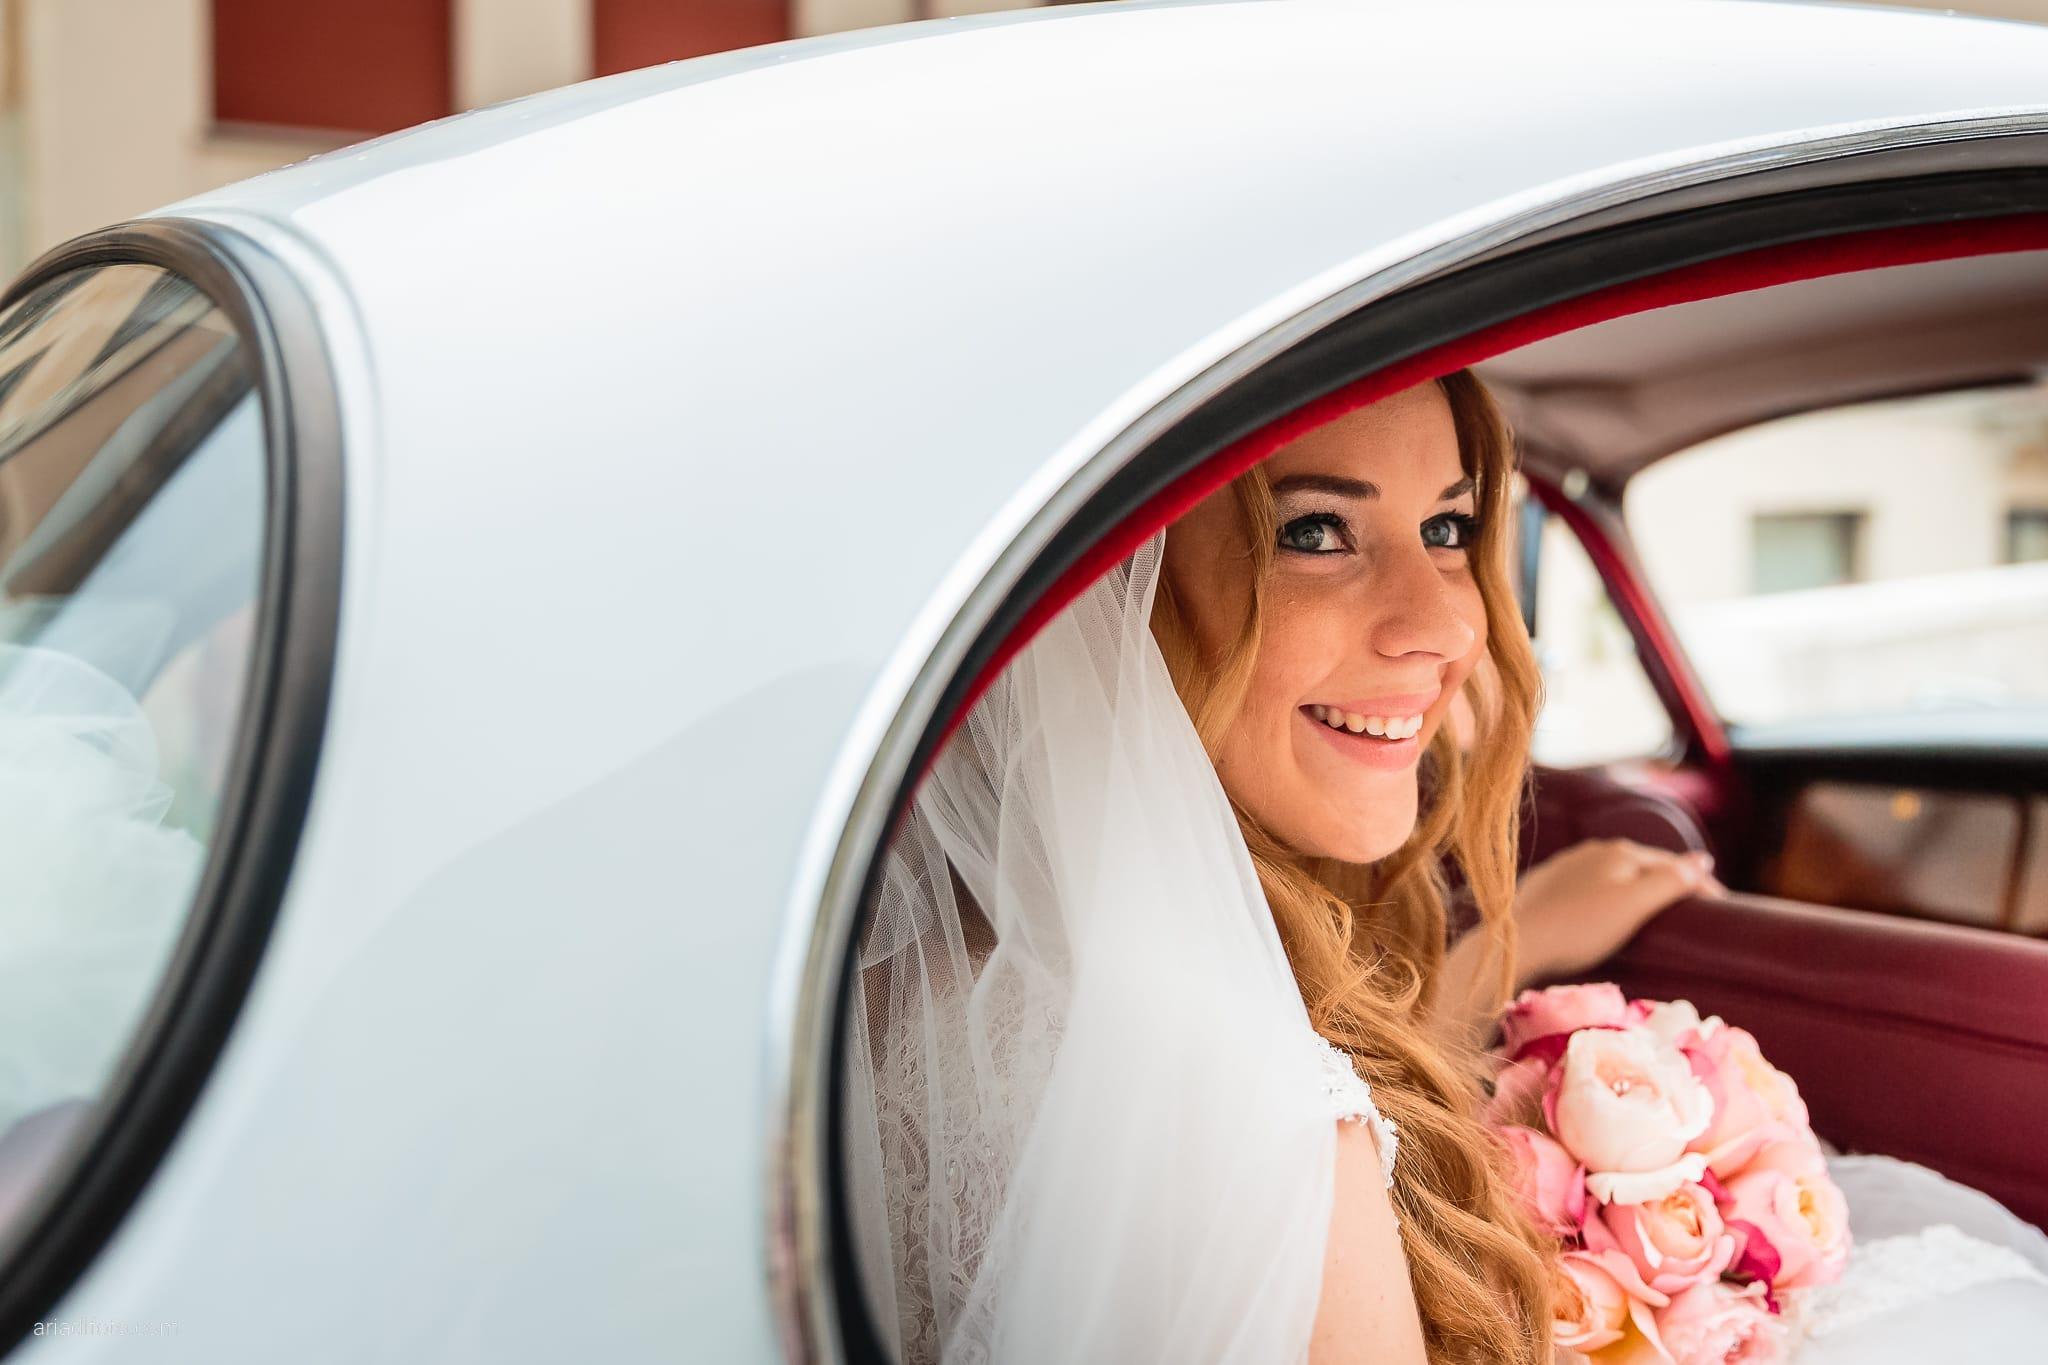 Valentina Francesco Matrimonio Chiesa San Giorgio Martire Pagnacco Castello Villalta Fagagna Udine cerimonia auto sposa